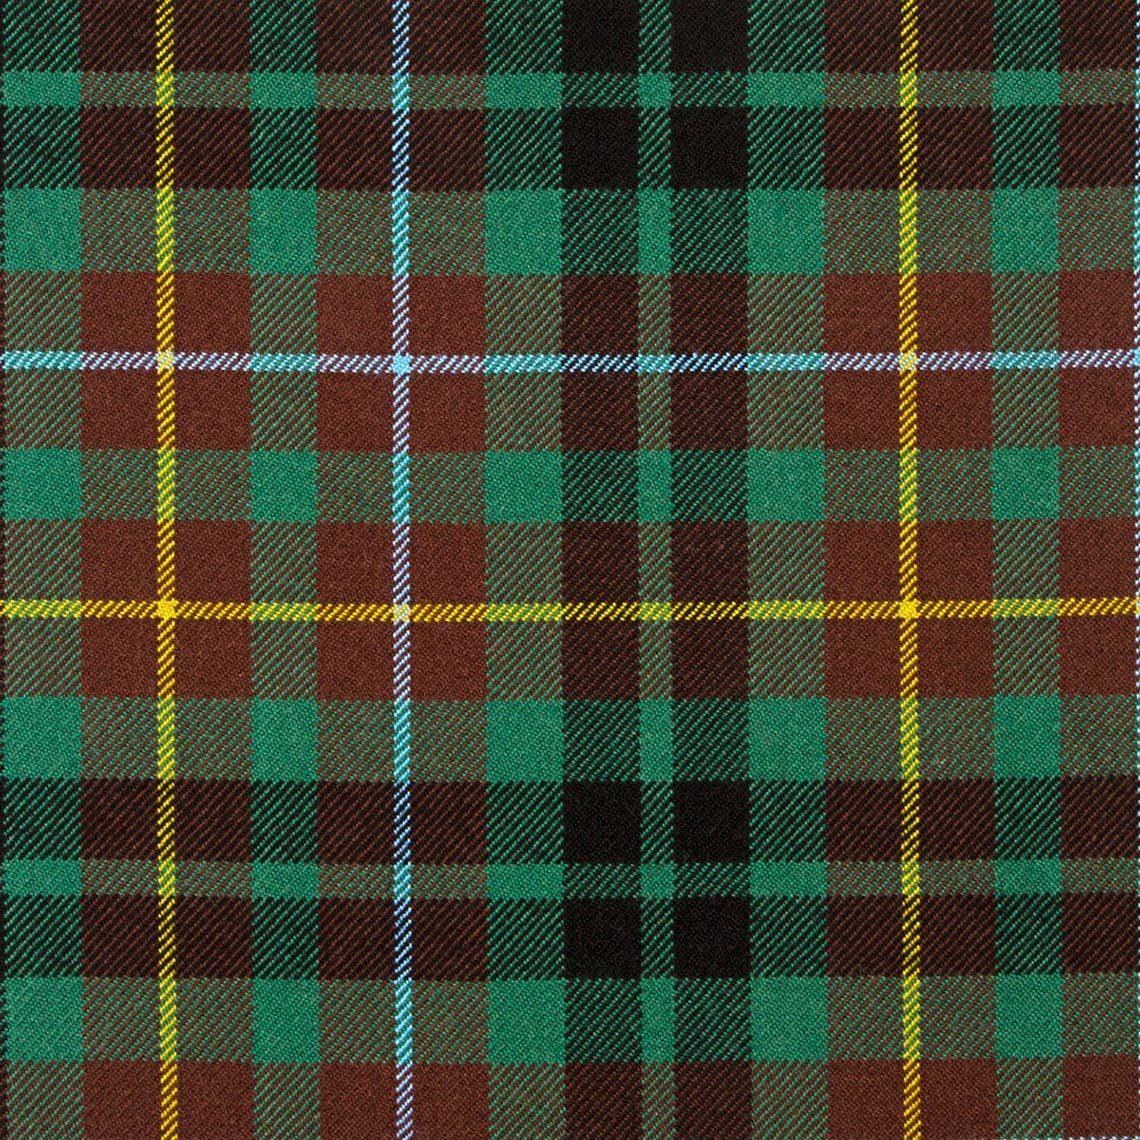 Buchanan (Hunting Ancient) Kilt